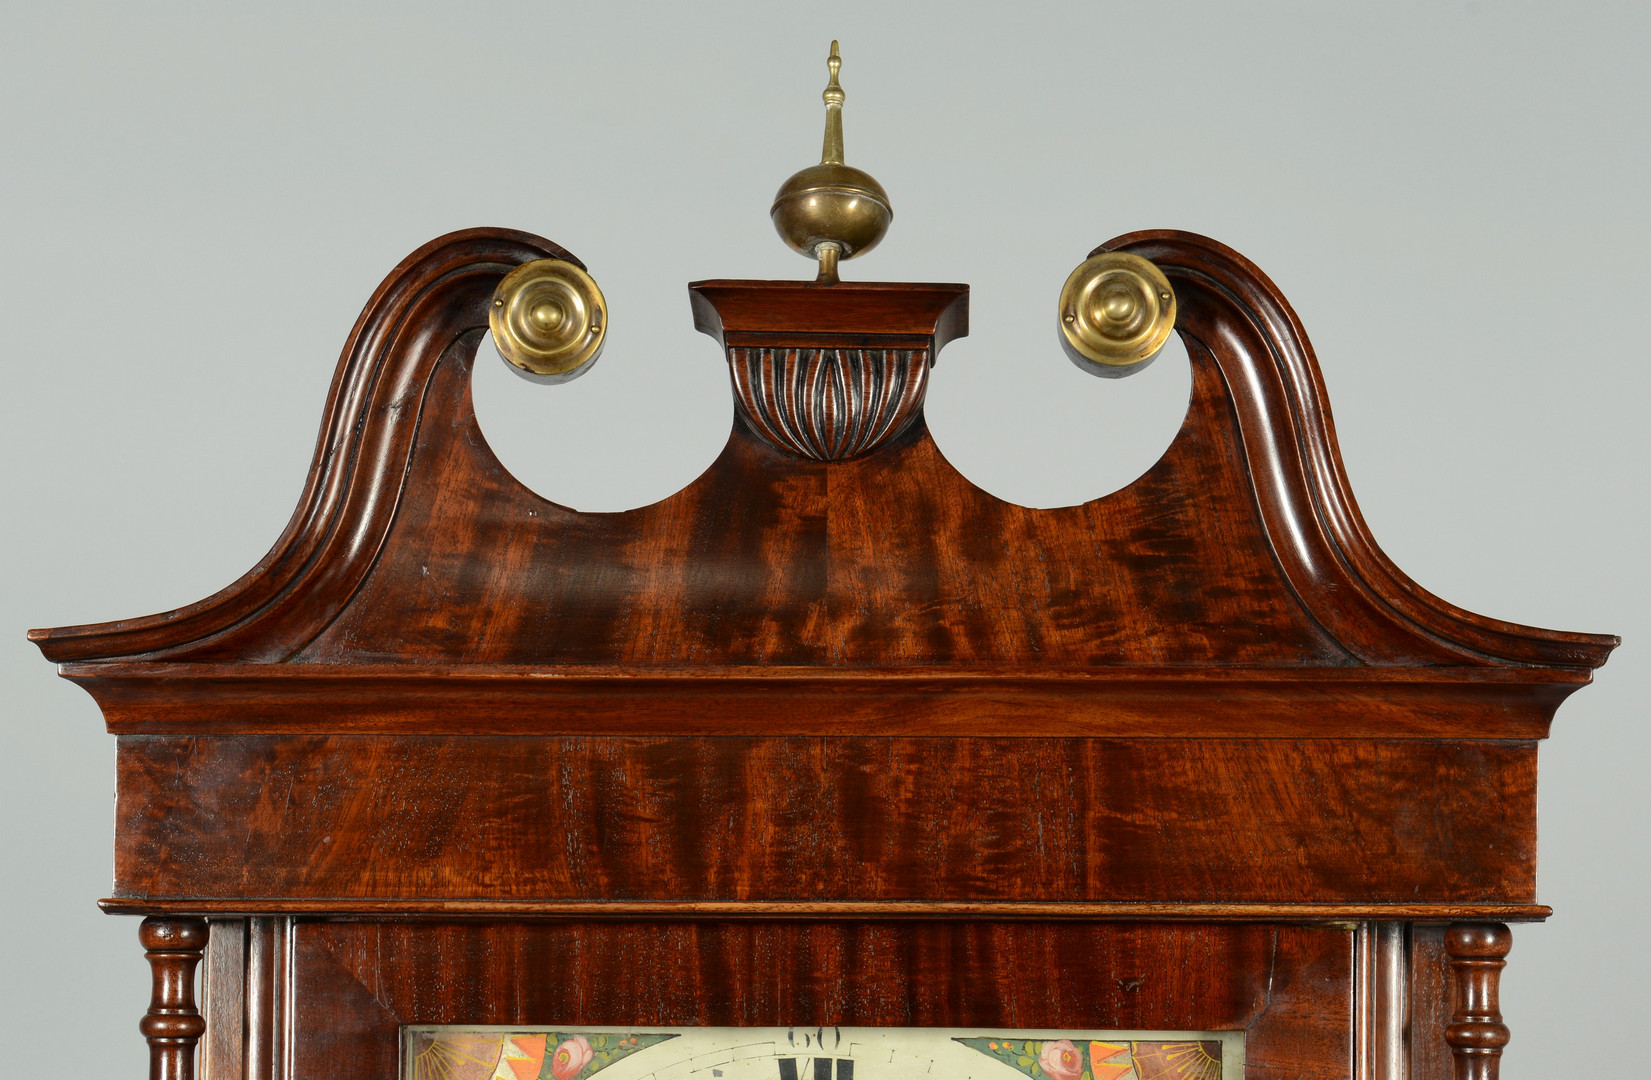 Lot 720: Tall Case Clock, circa 1825